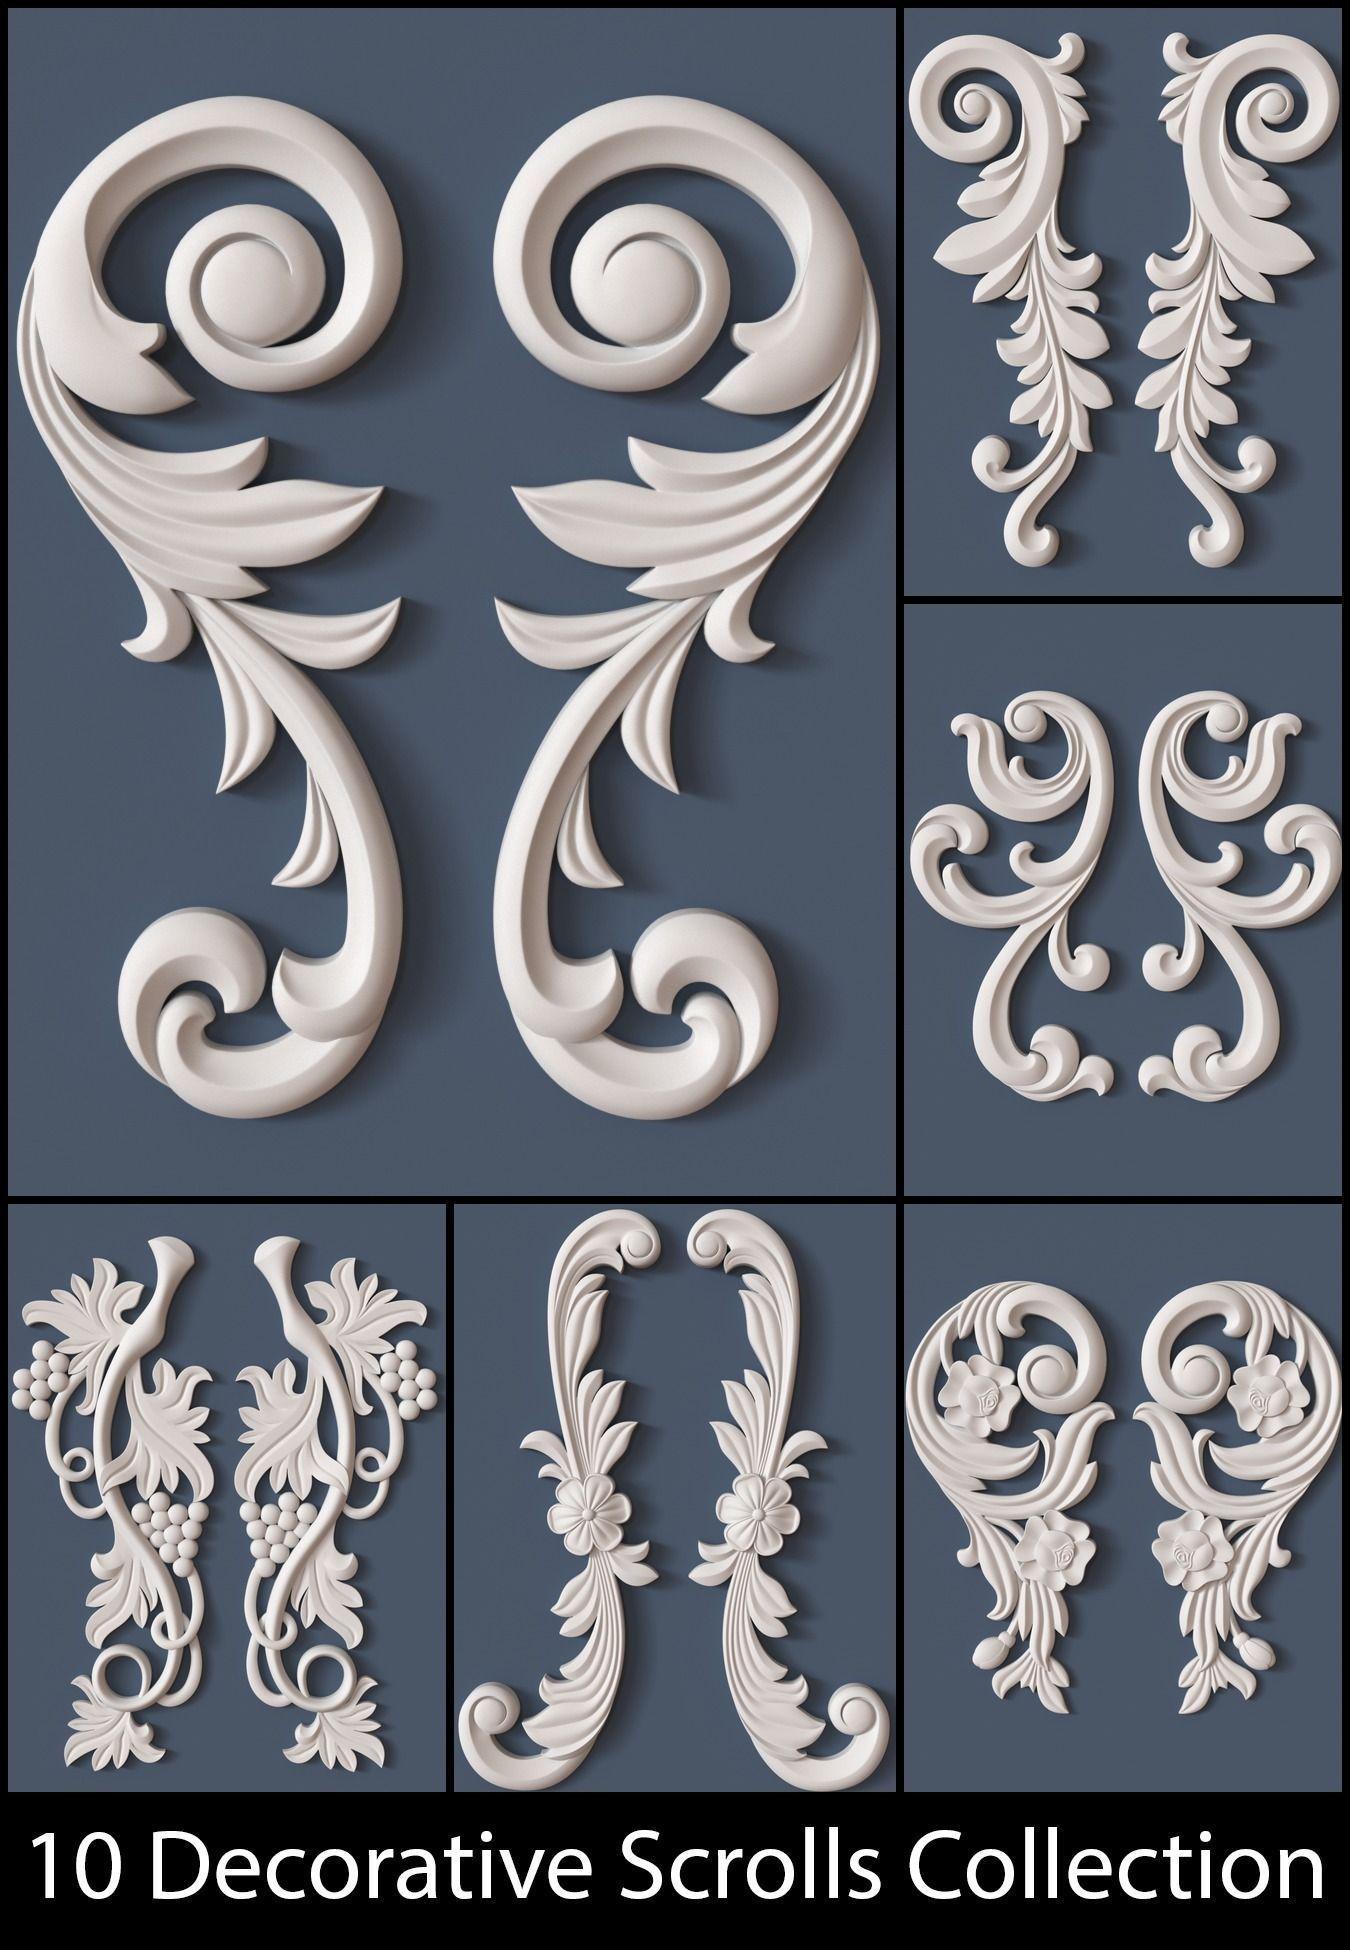 10 Decorative Scrolls Collection